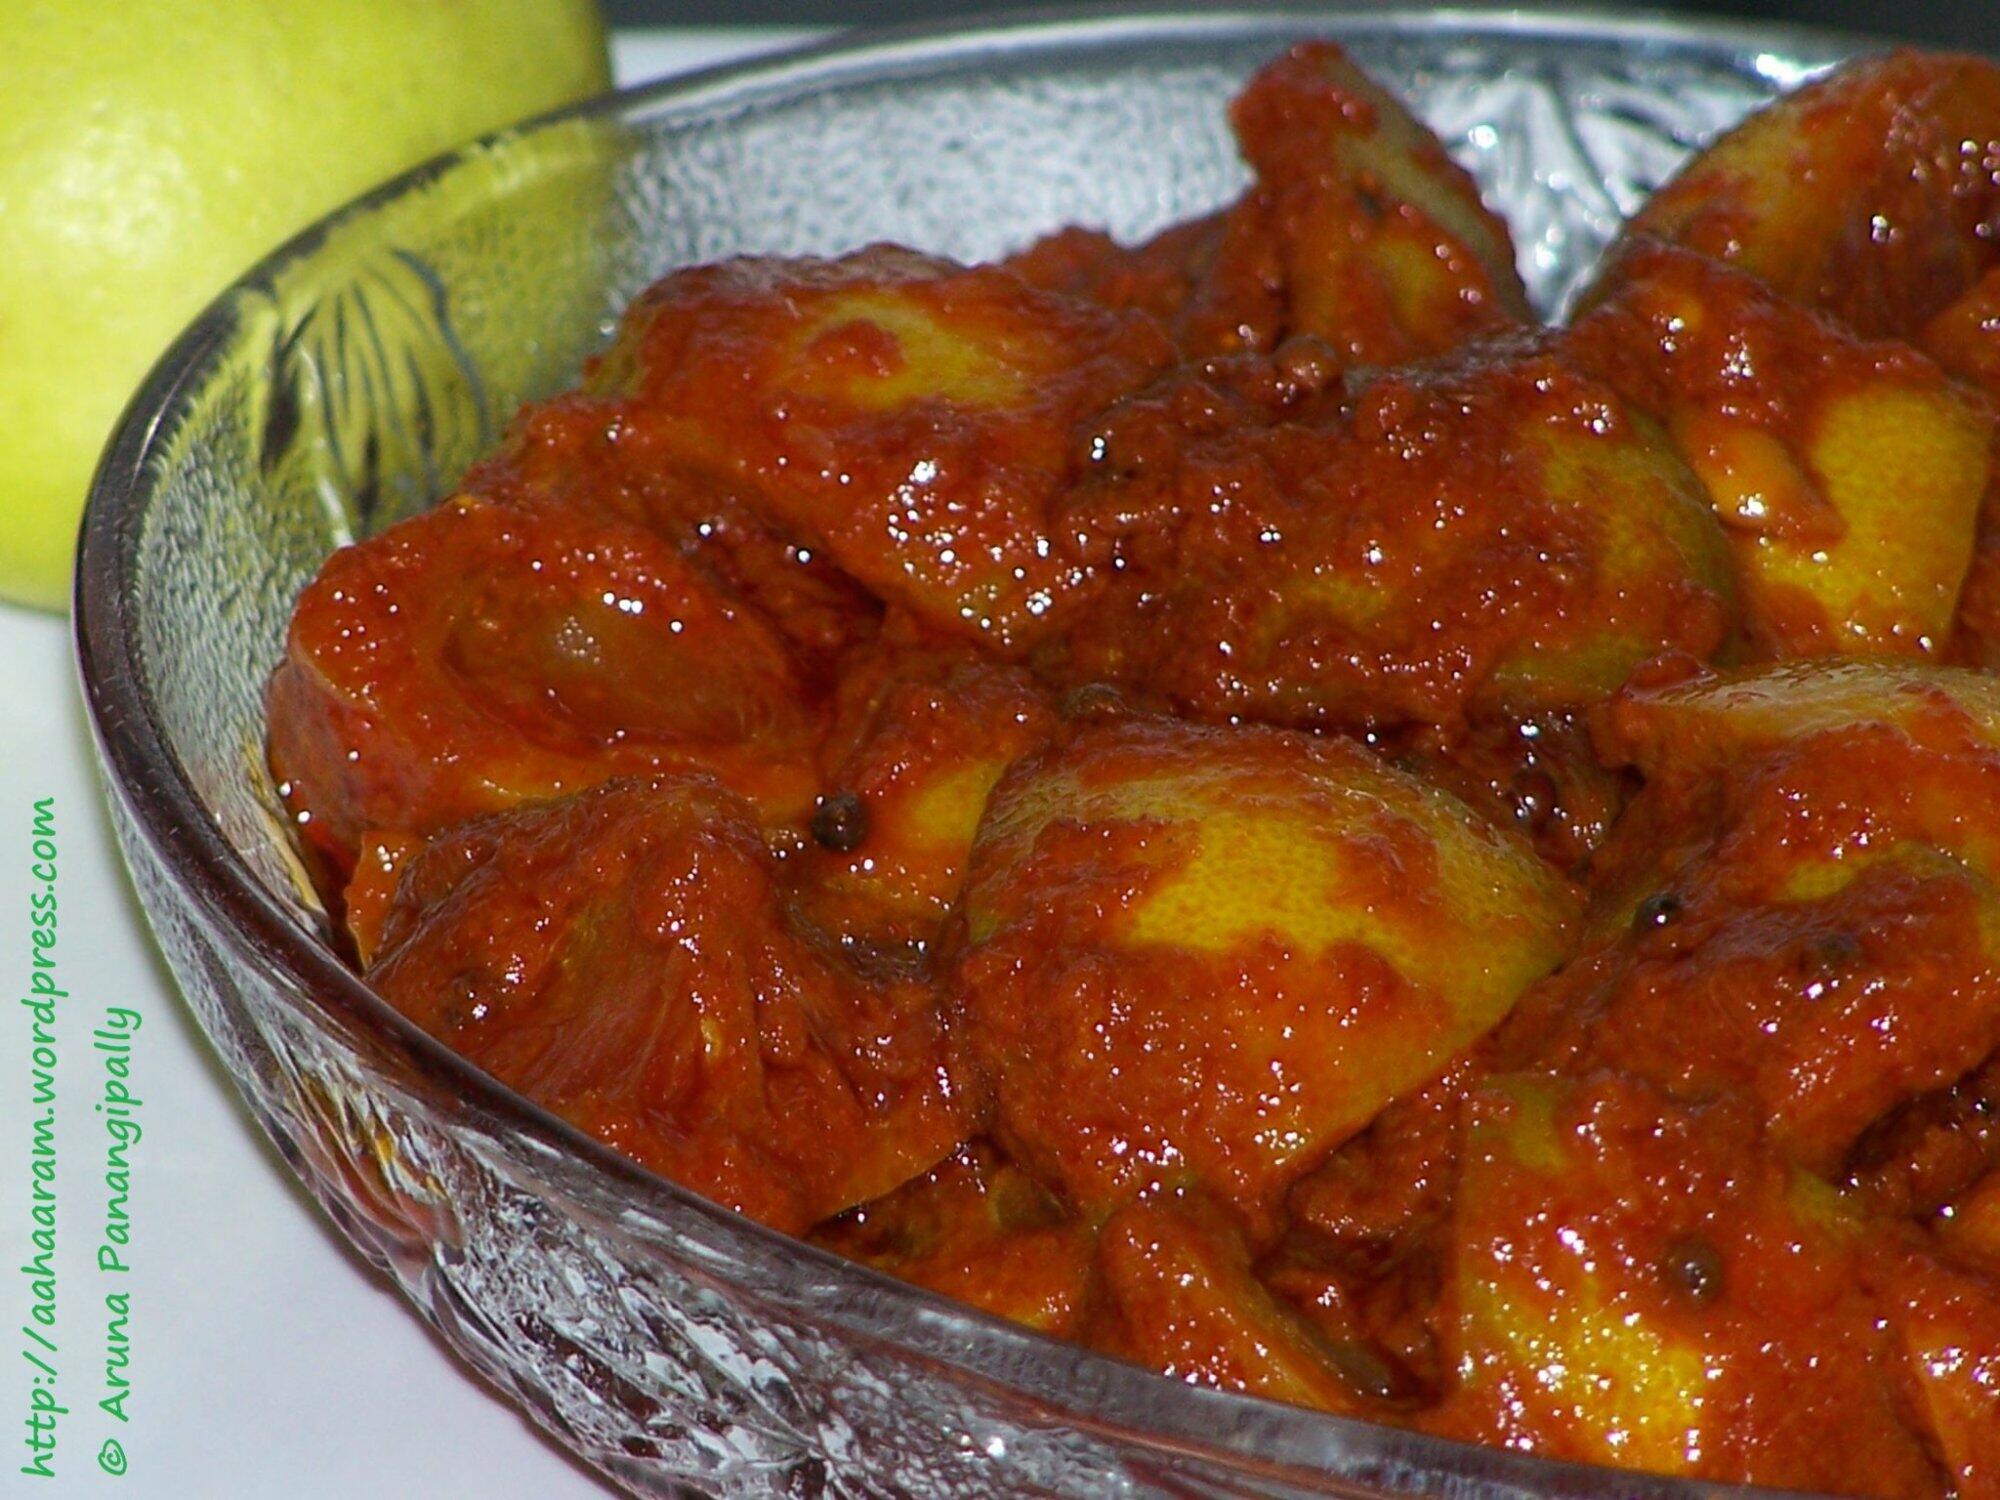 Nimmakaya Uragaya 1 Andhra Lemon Pickle With Oil Aharam